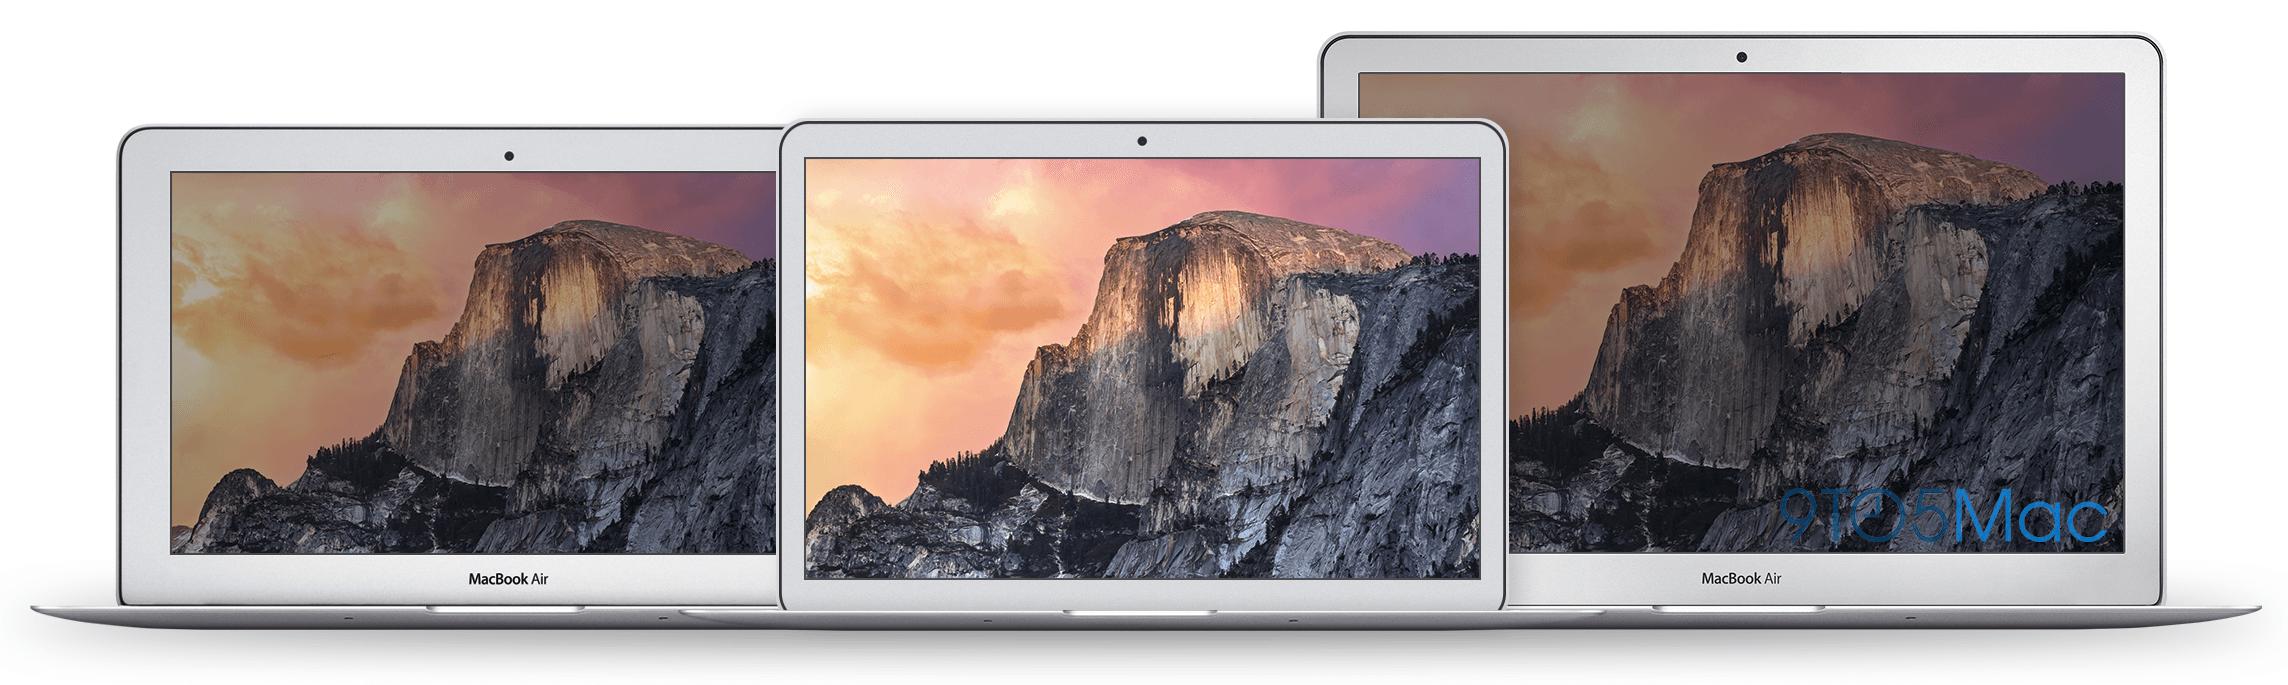 MacBook Air 12 inch 1